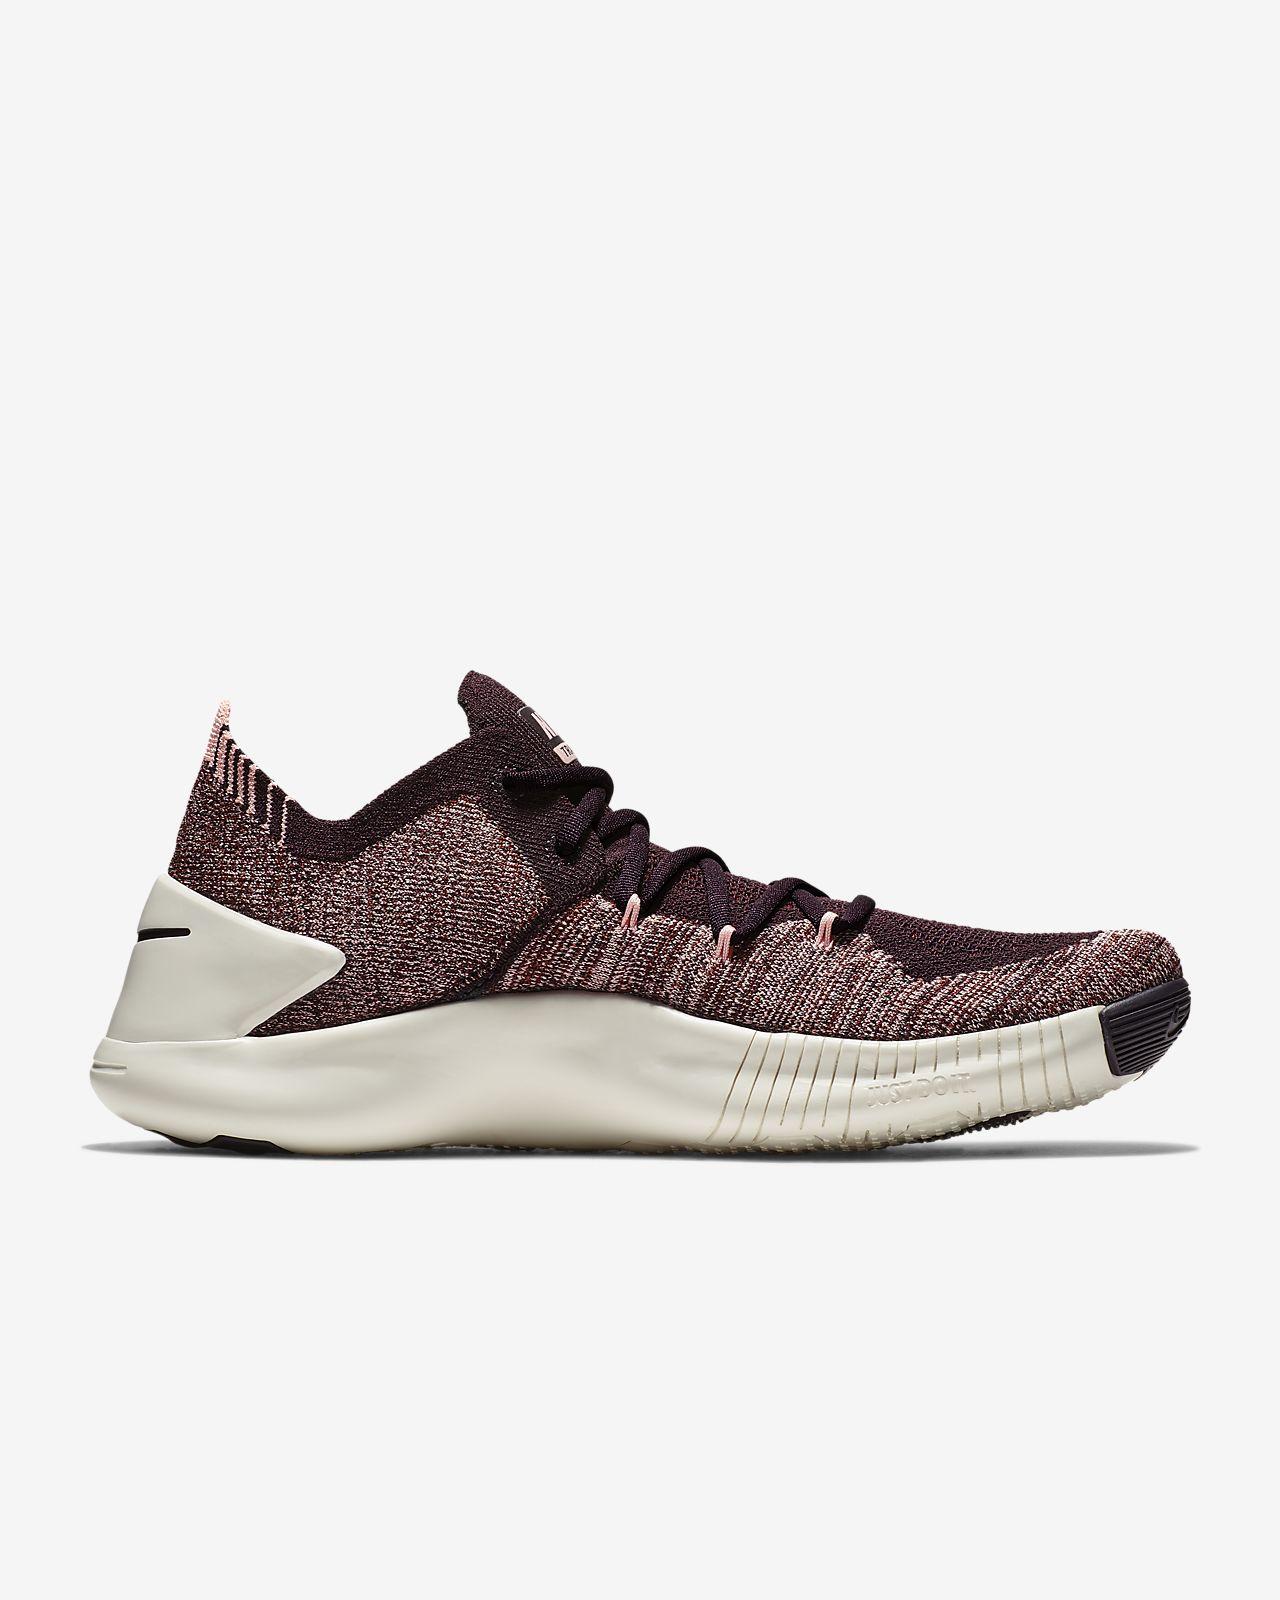 746b31c1ecd6 Nike Free TR Flyknit 3 Women s Gym HIIT Cross Training Shoe ...